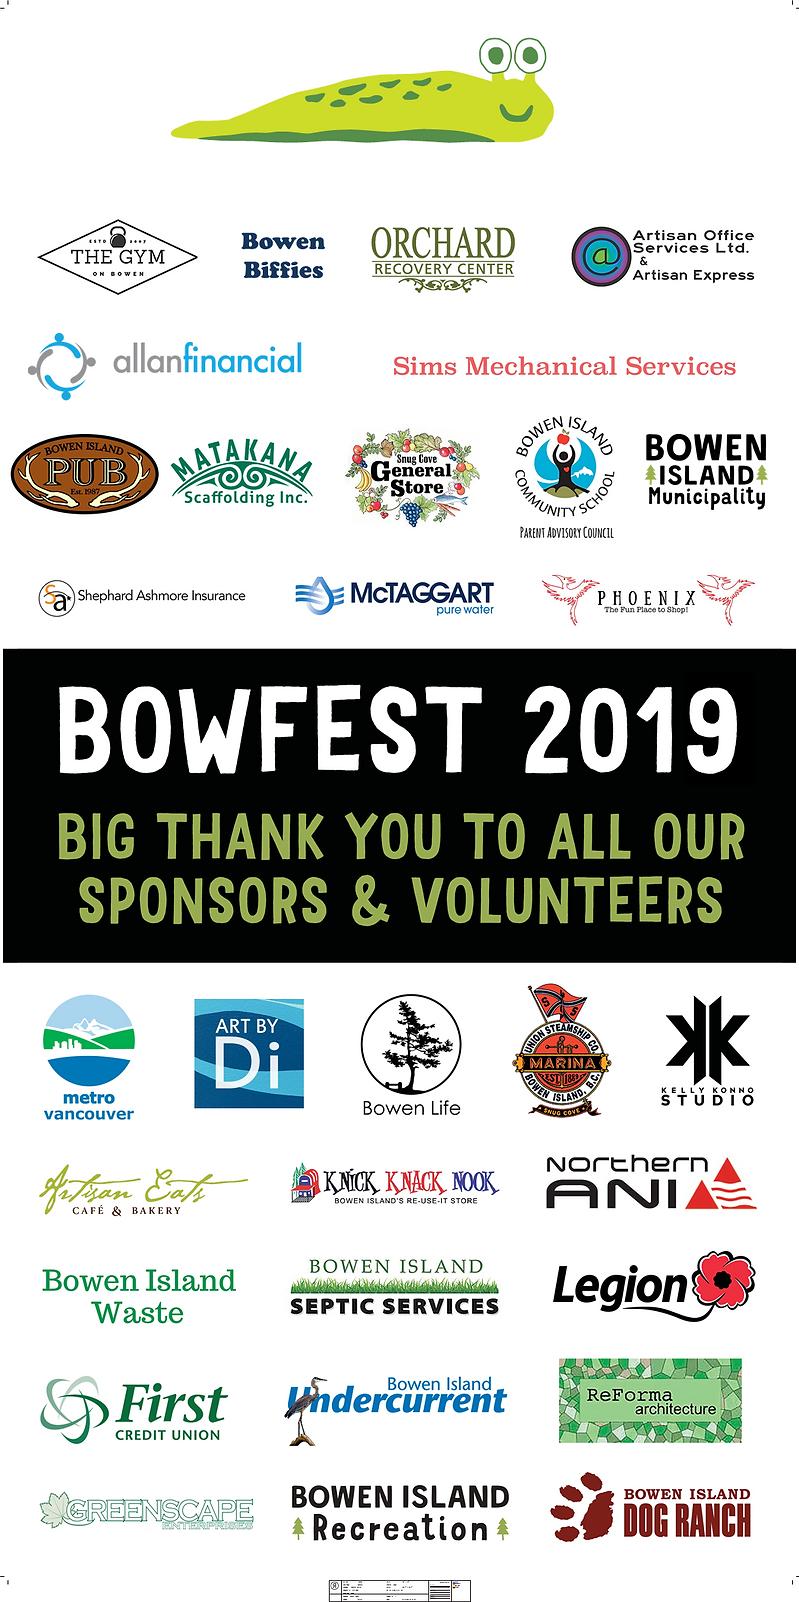 C18-1067_2019Bowfest_Sponsor_Poster_48x9